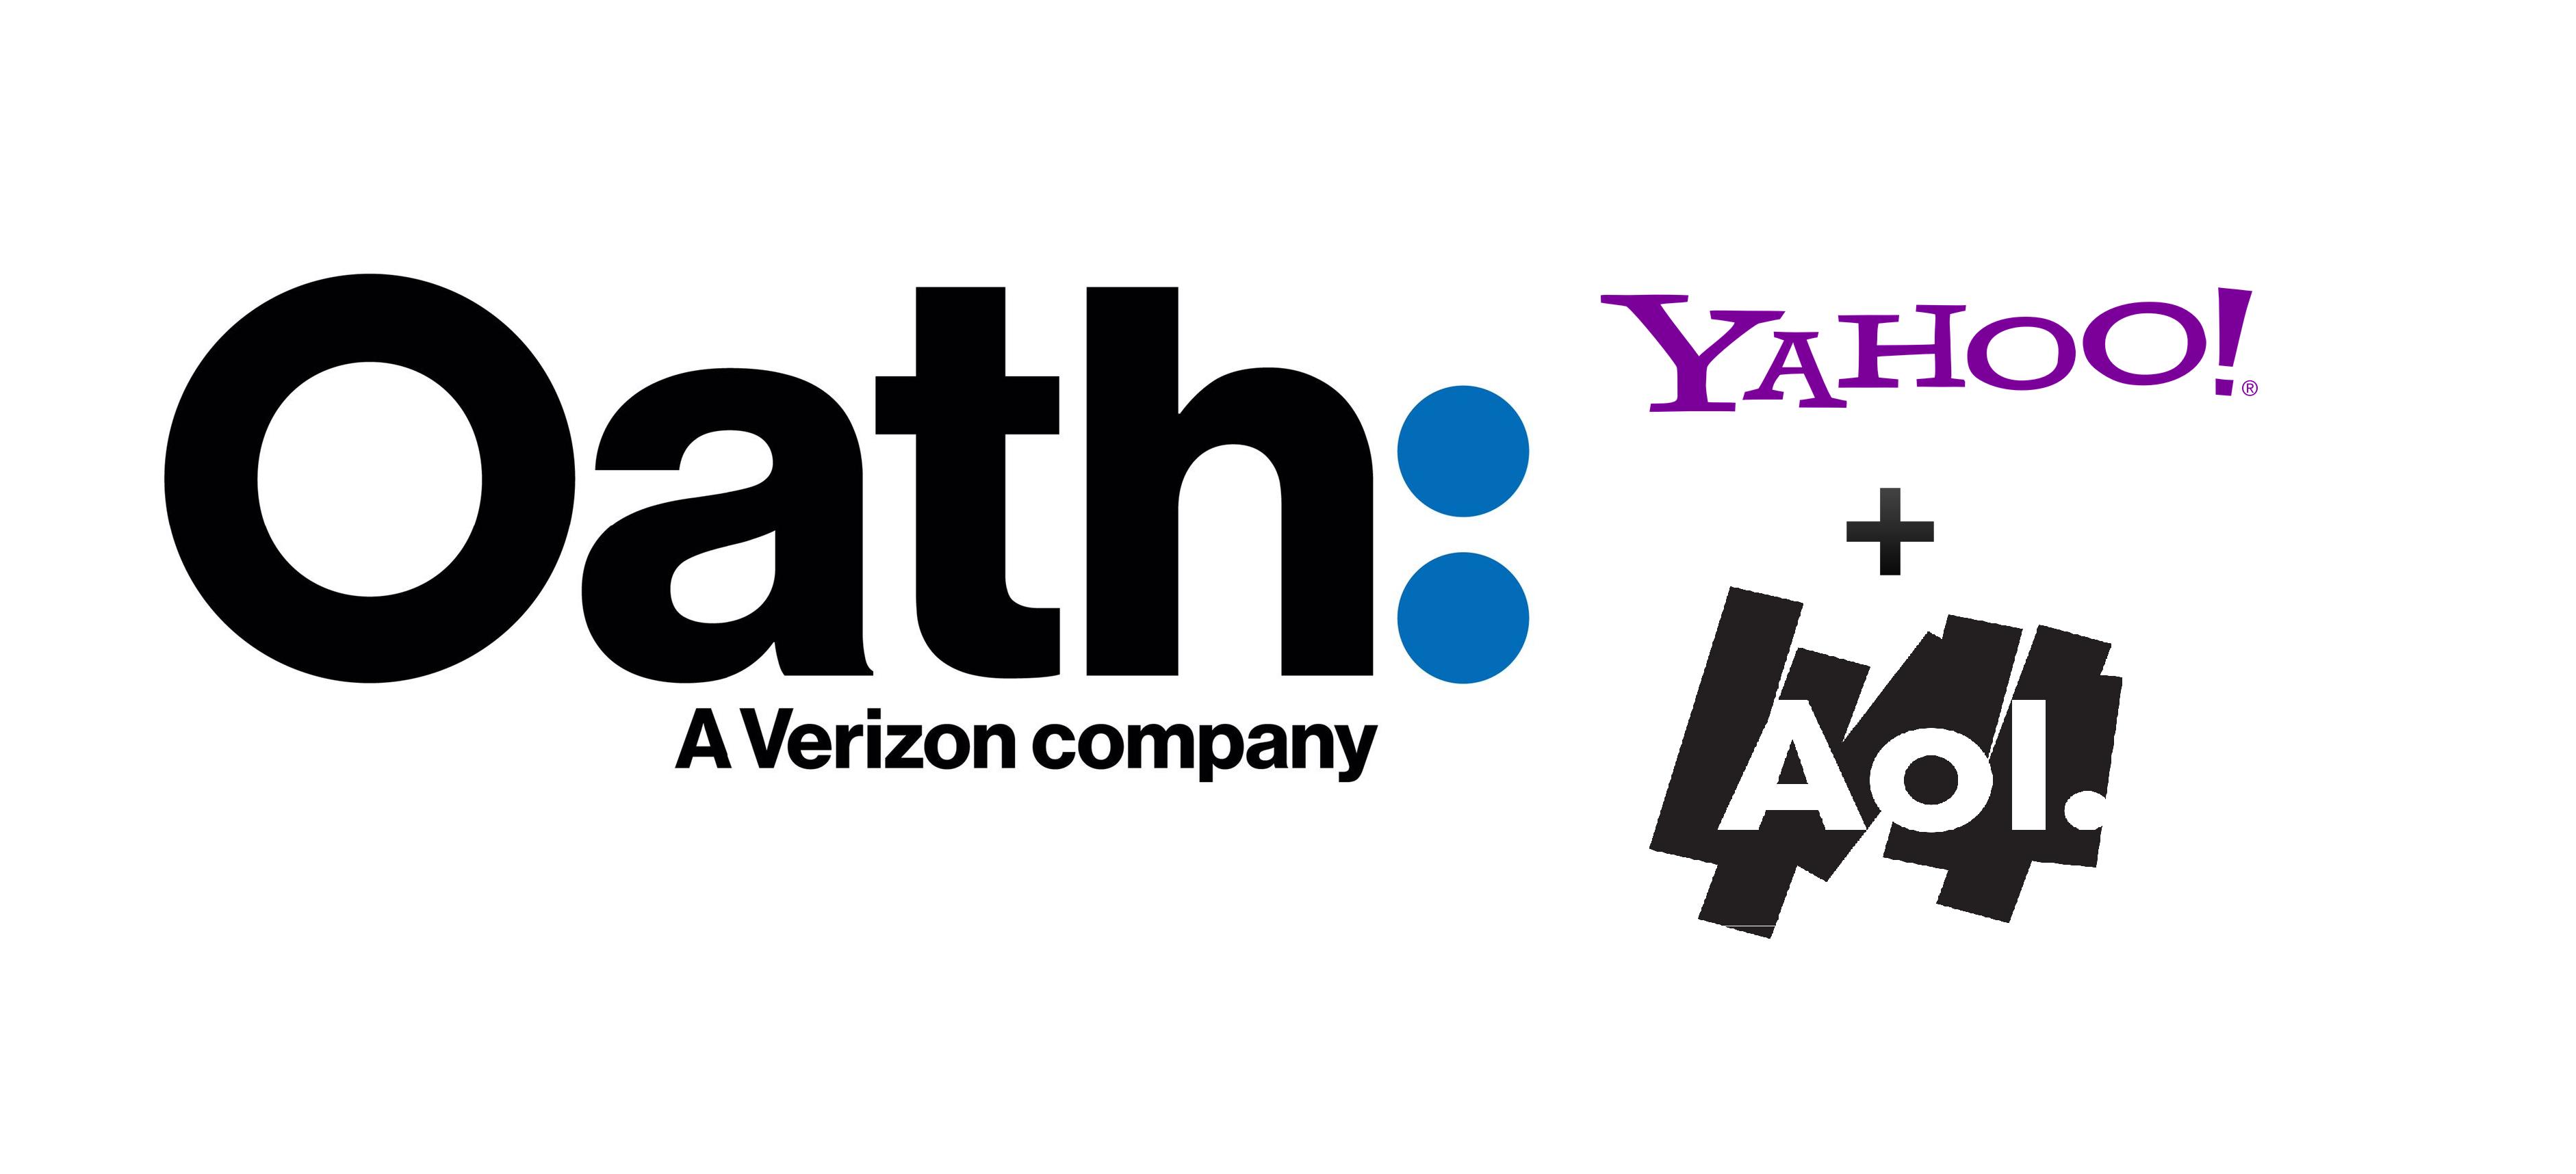 Oath Yahoo AOL